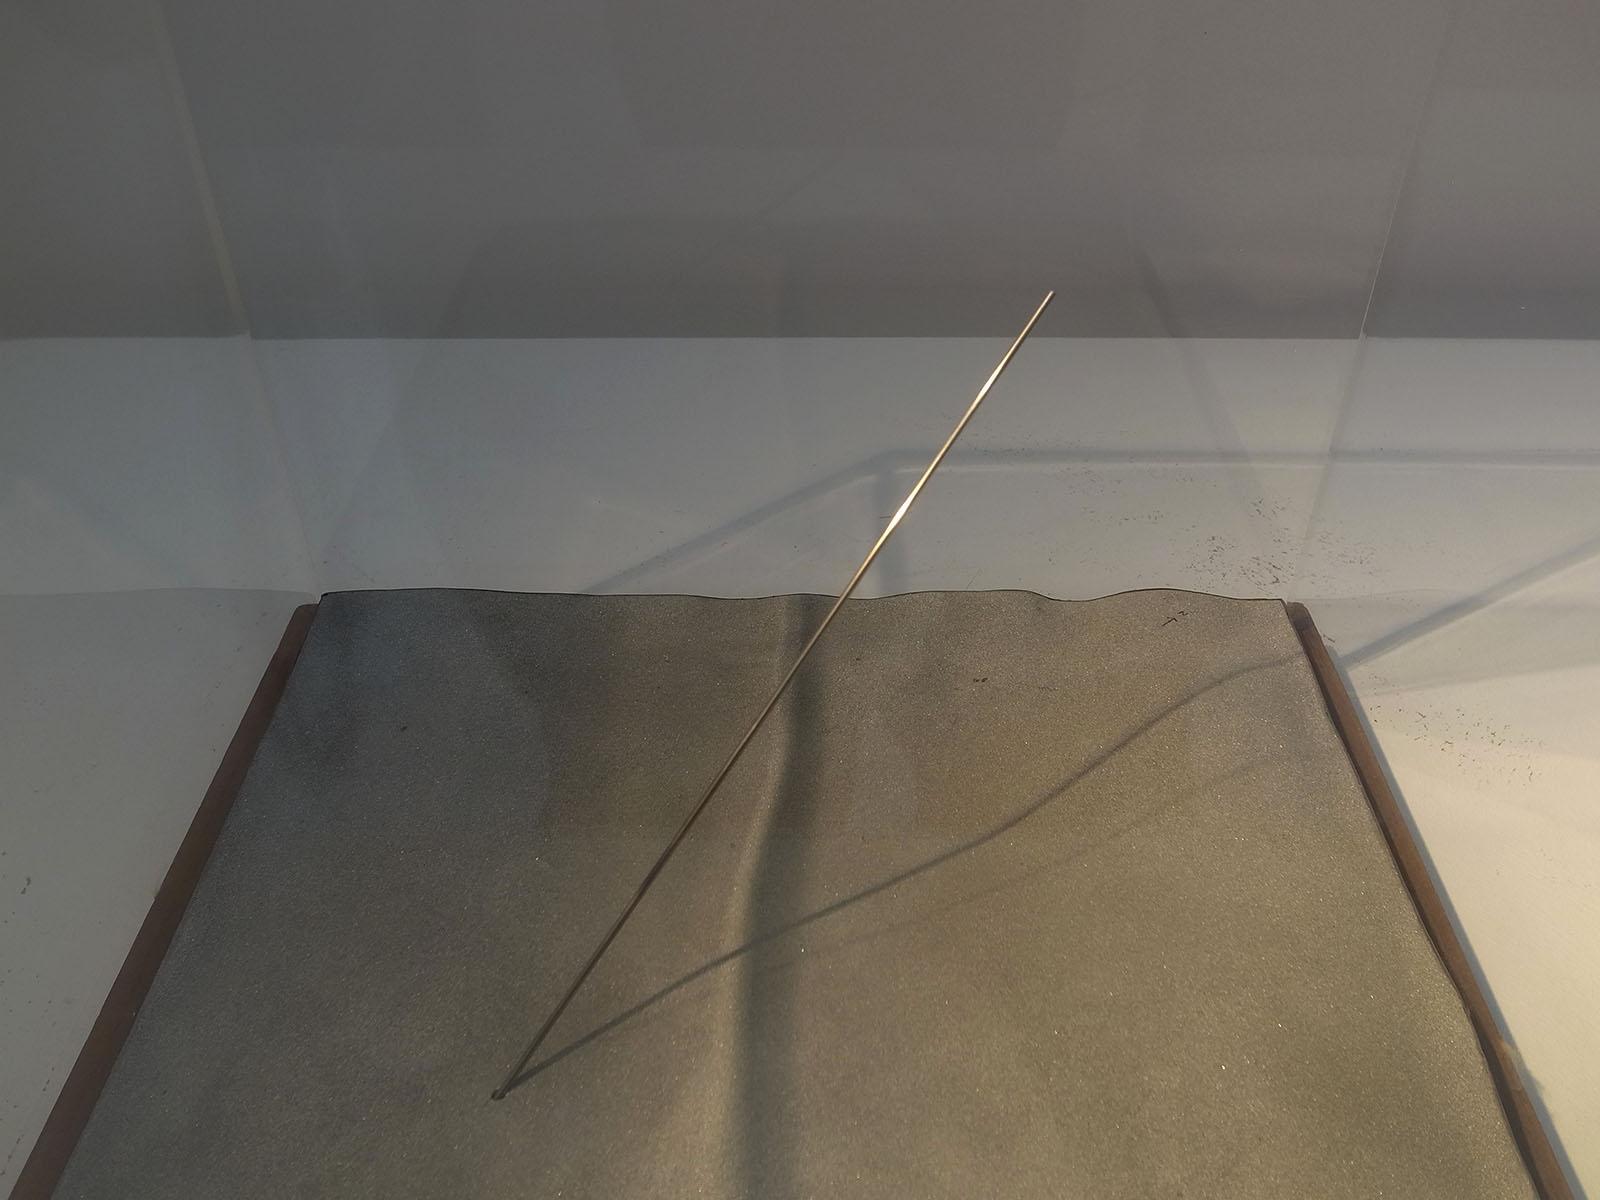 kowalski-axe